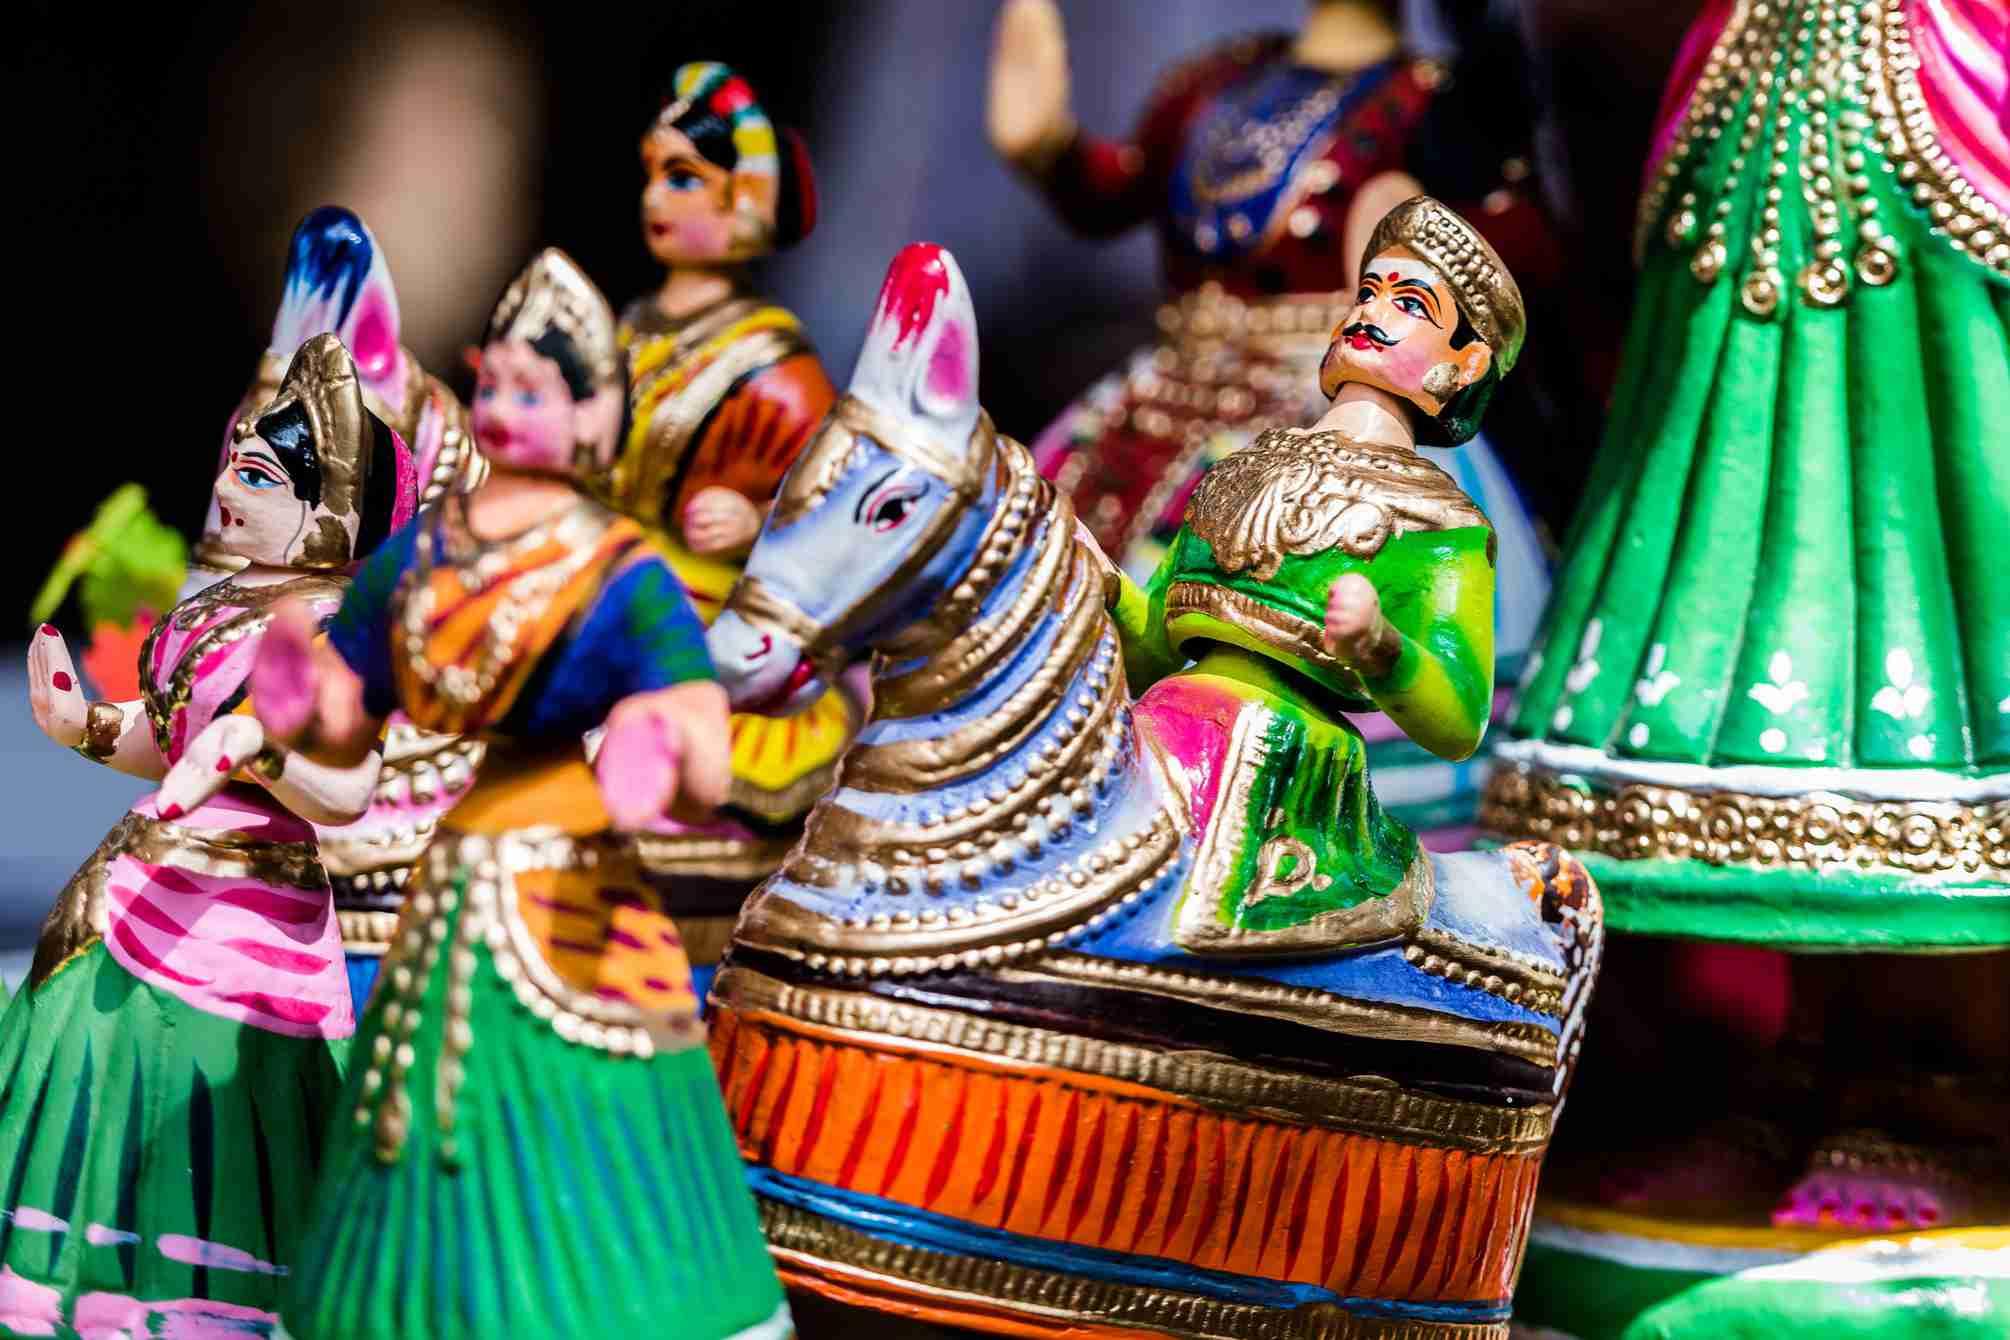 Thanjavur dolls.